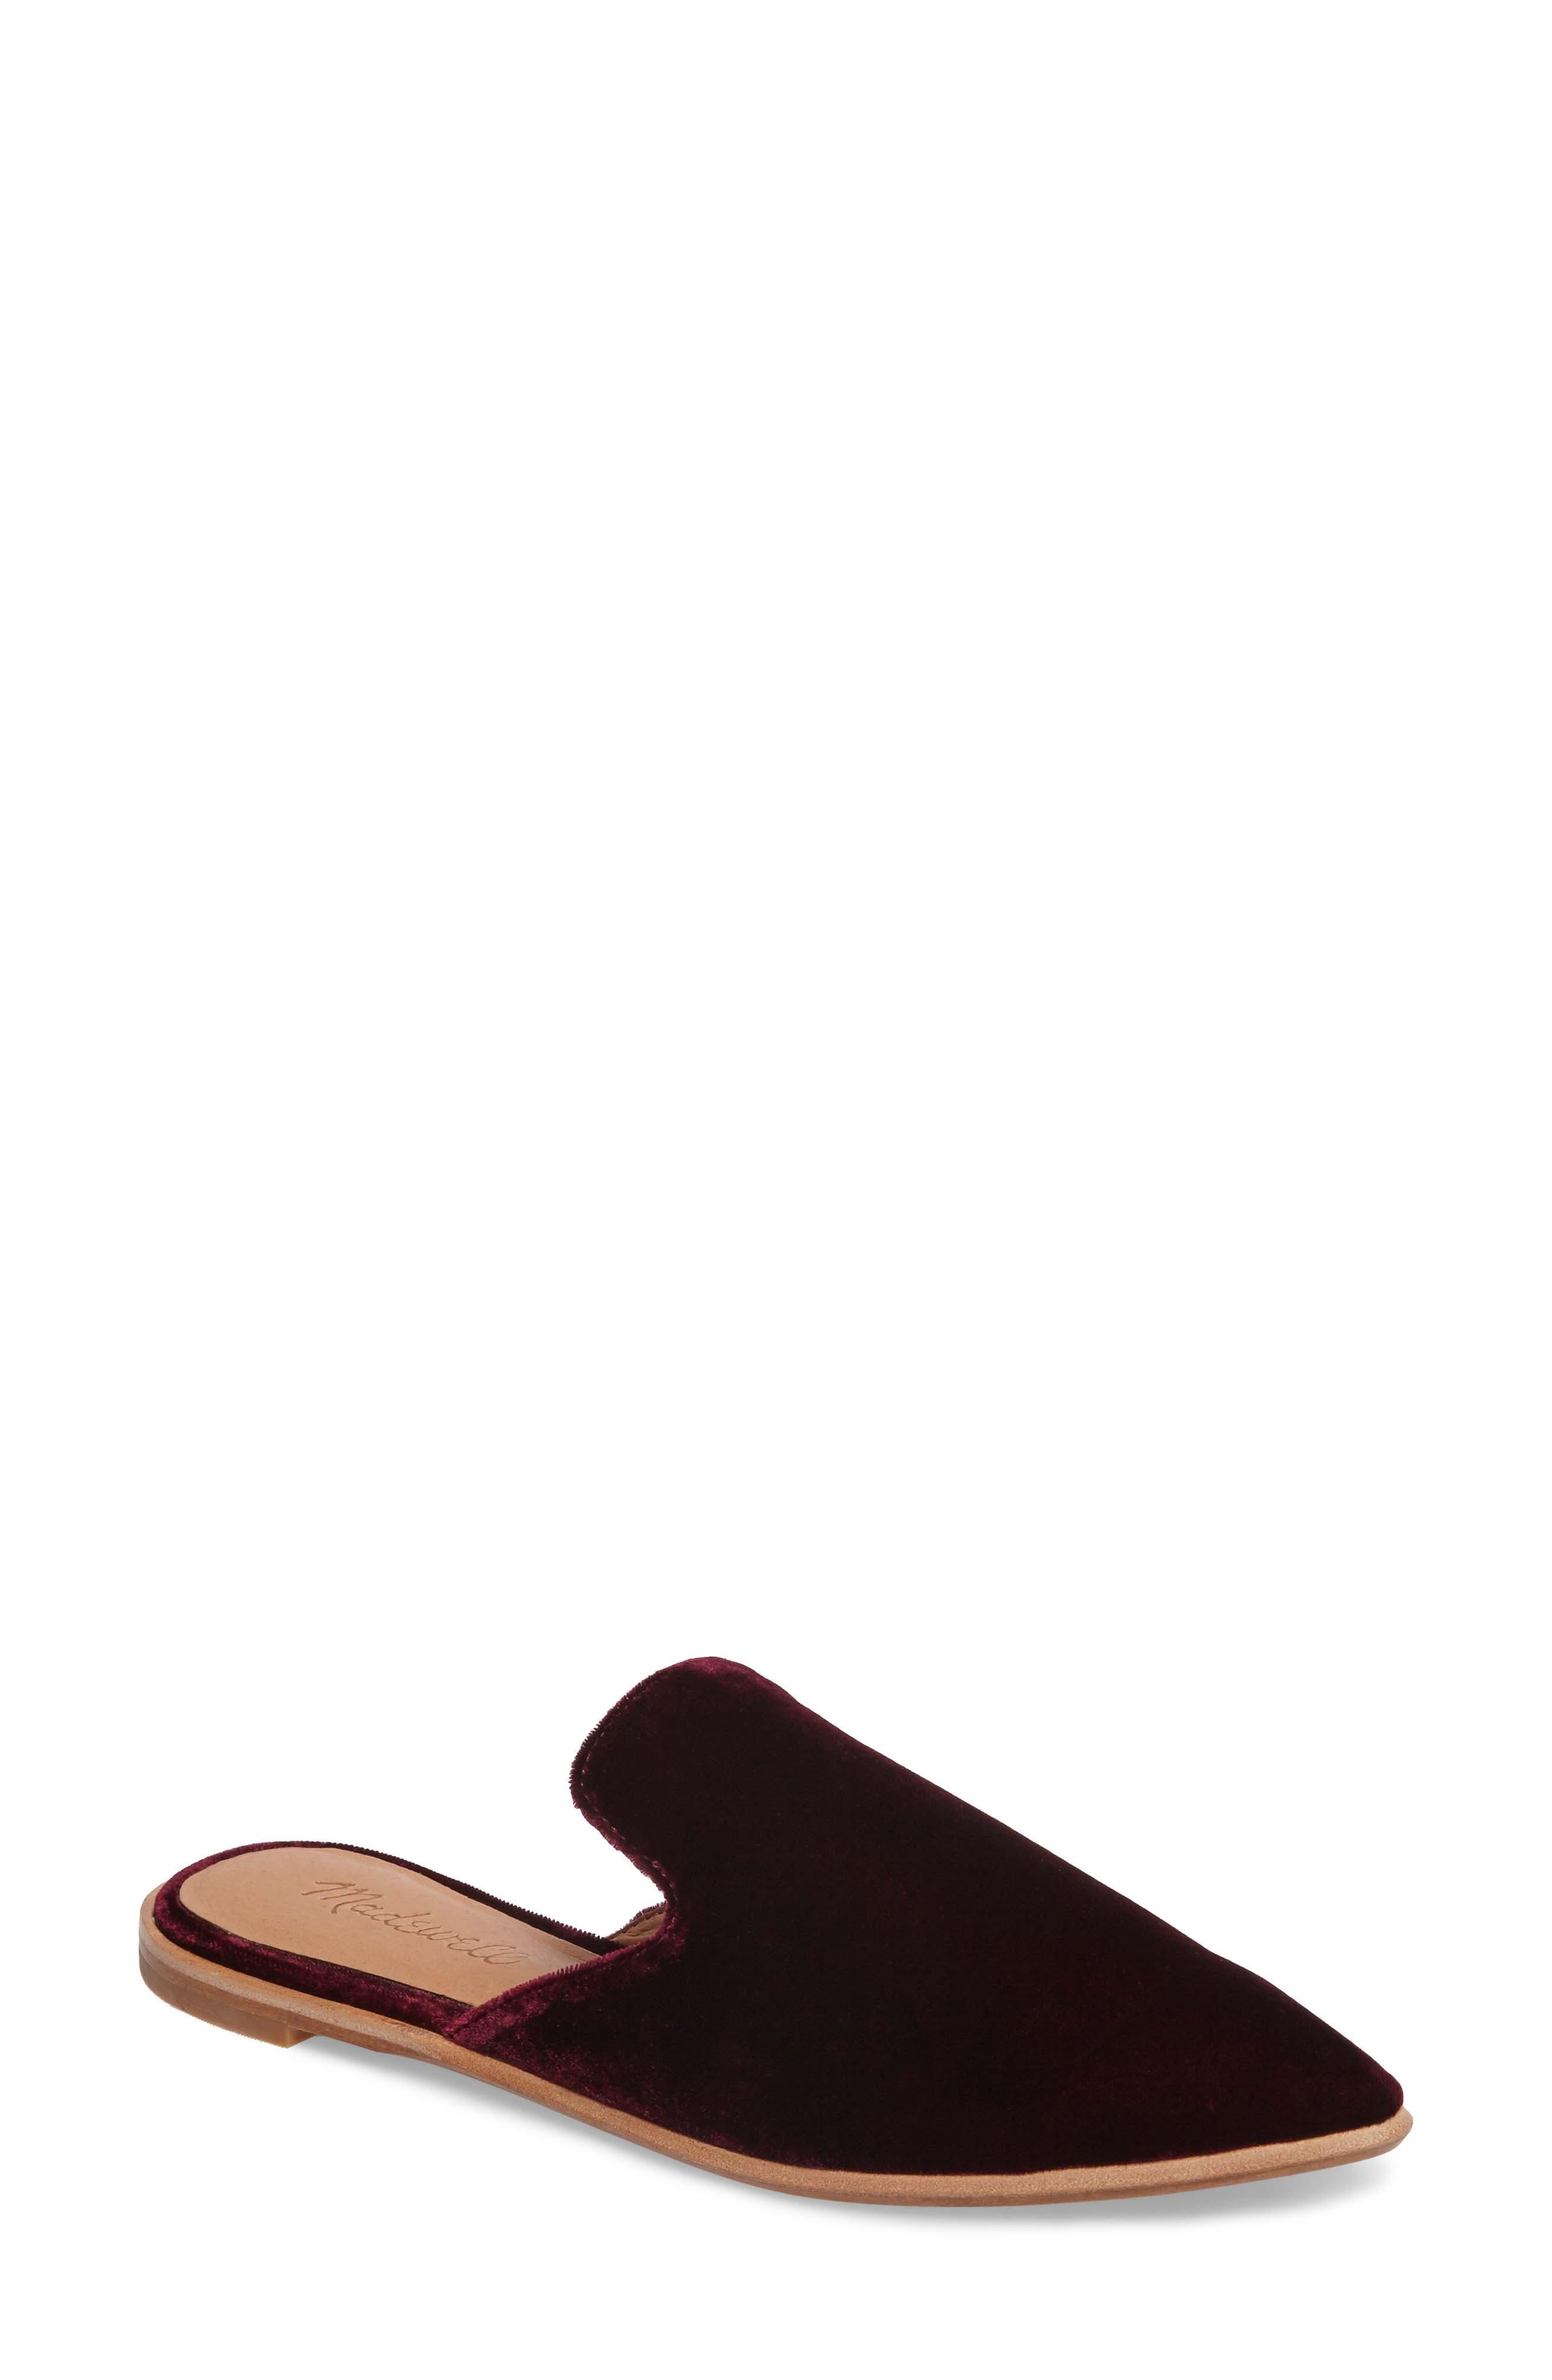 Alternate Image 1 Selected - Madewell Gemma Pointy Toe Mule (Women)